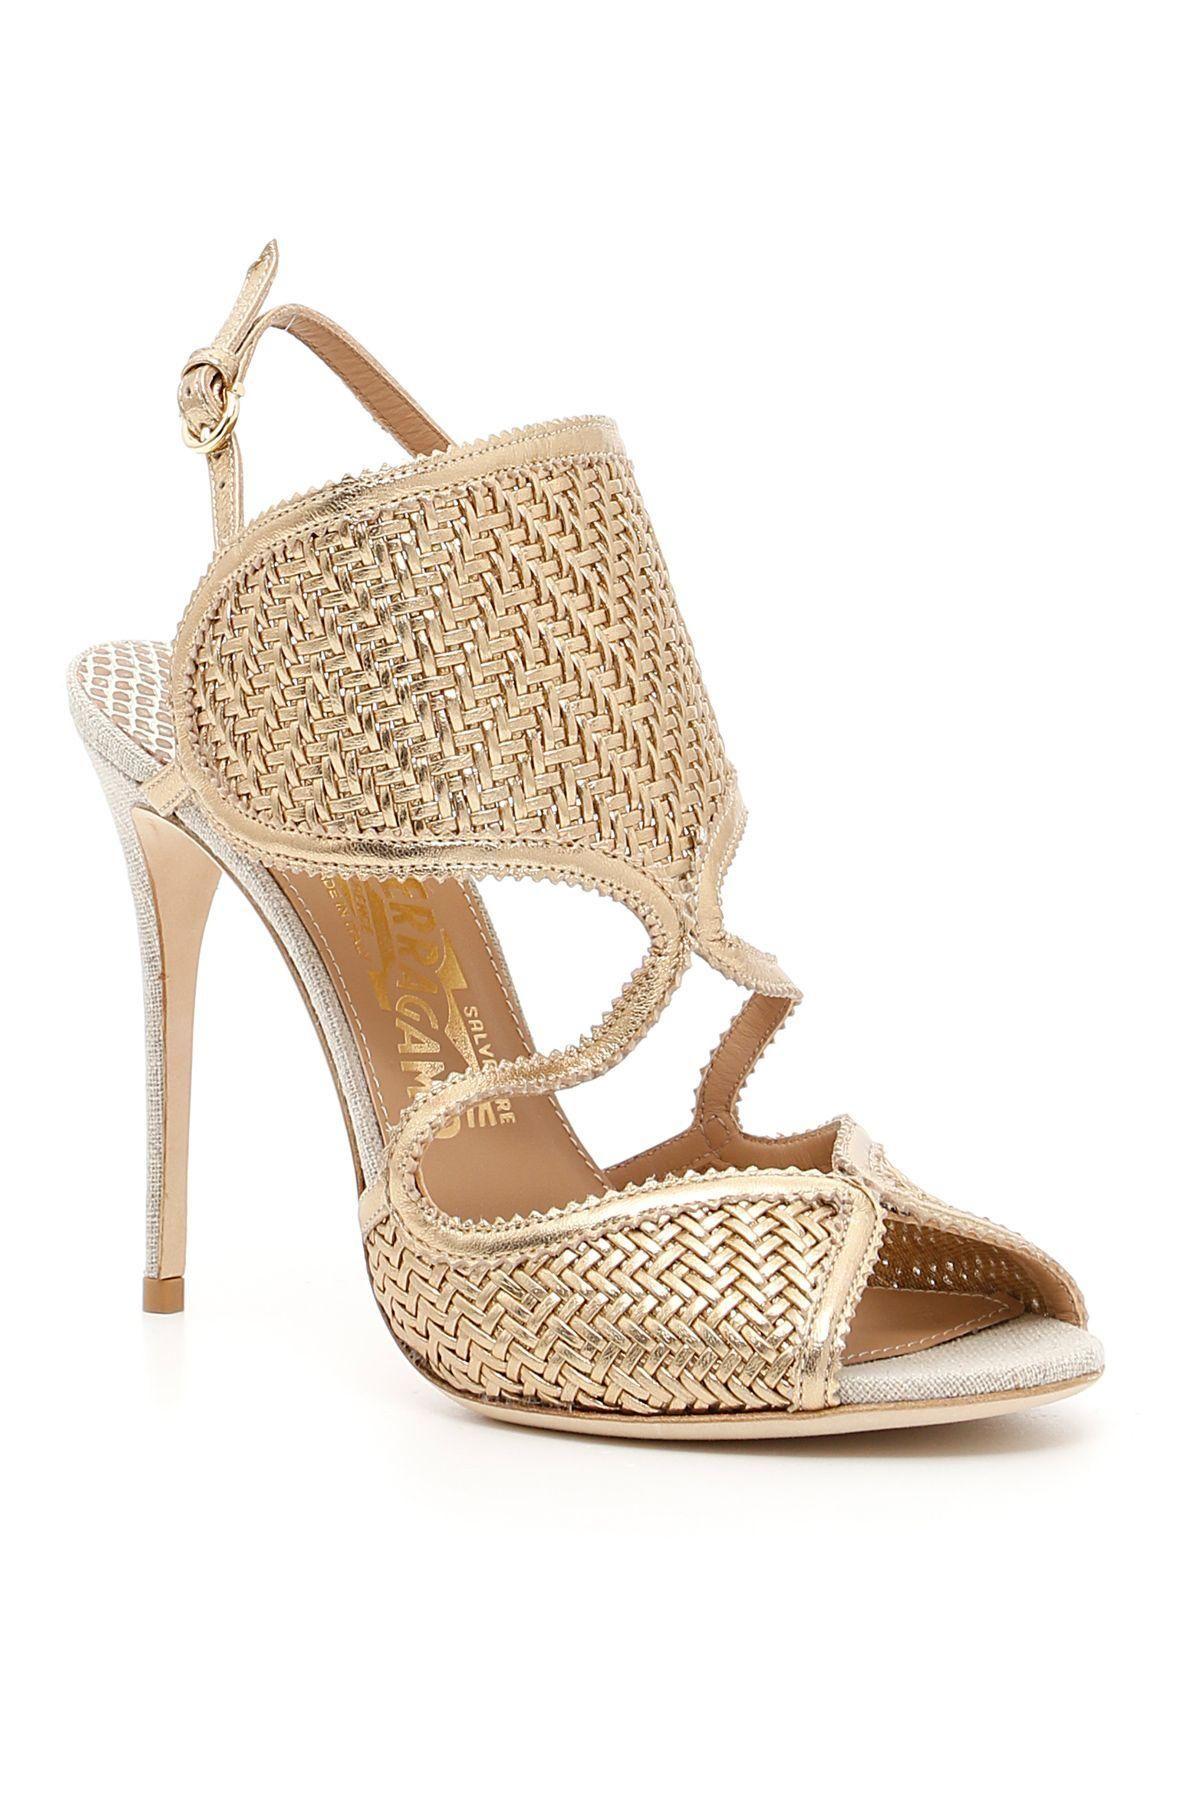 Salvatore Ferragamo Woven Slingback Sandals discount ebay 2NDF8O